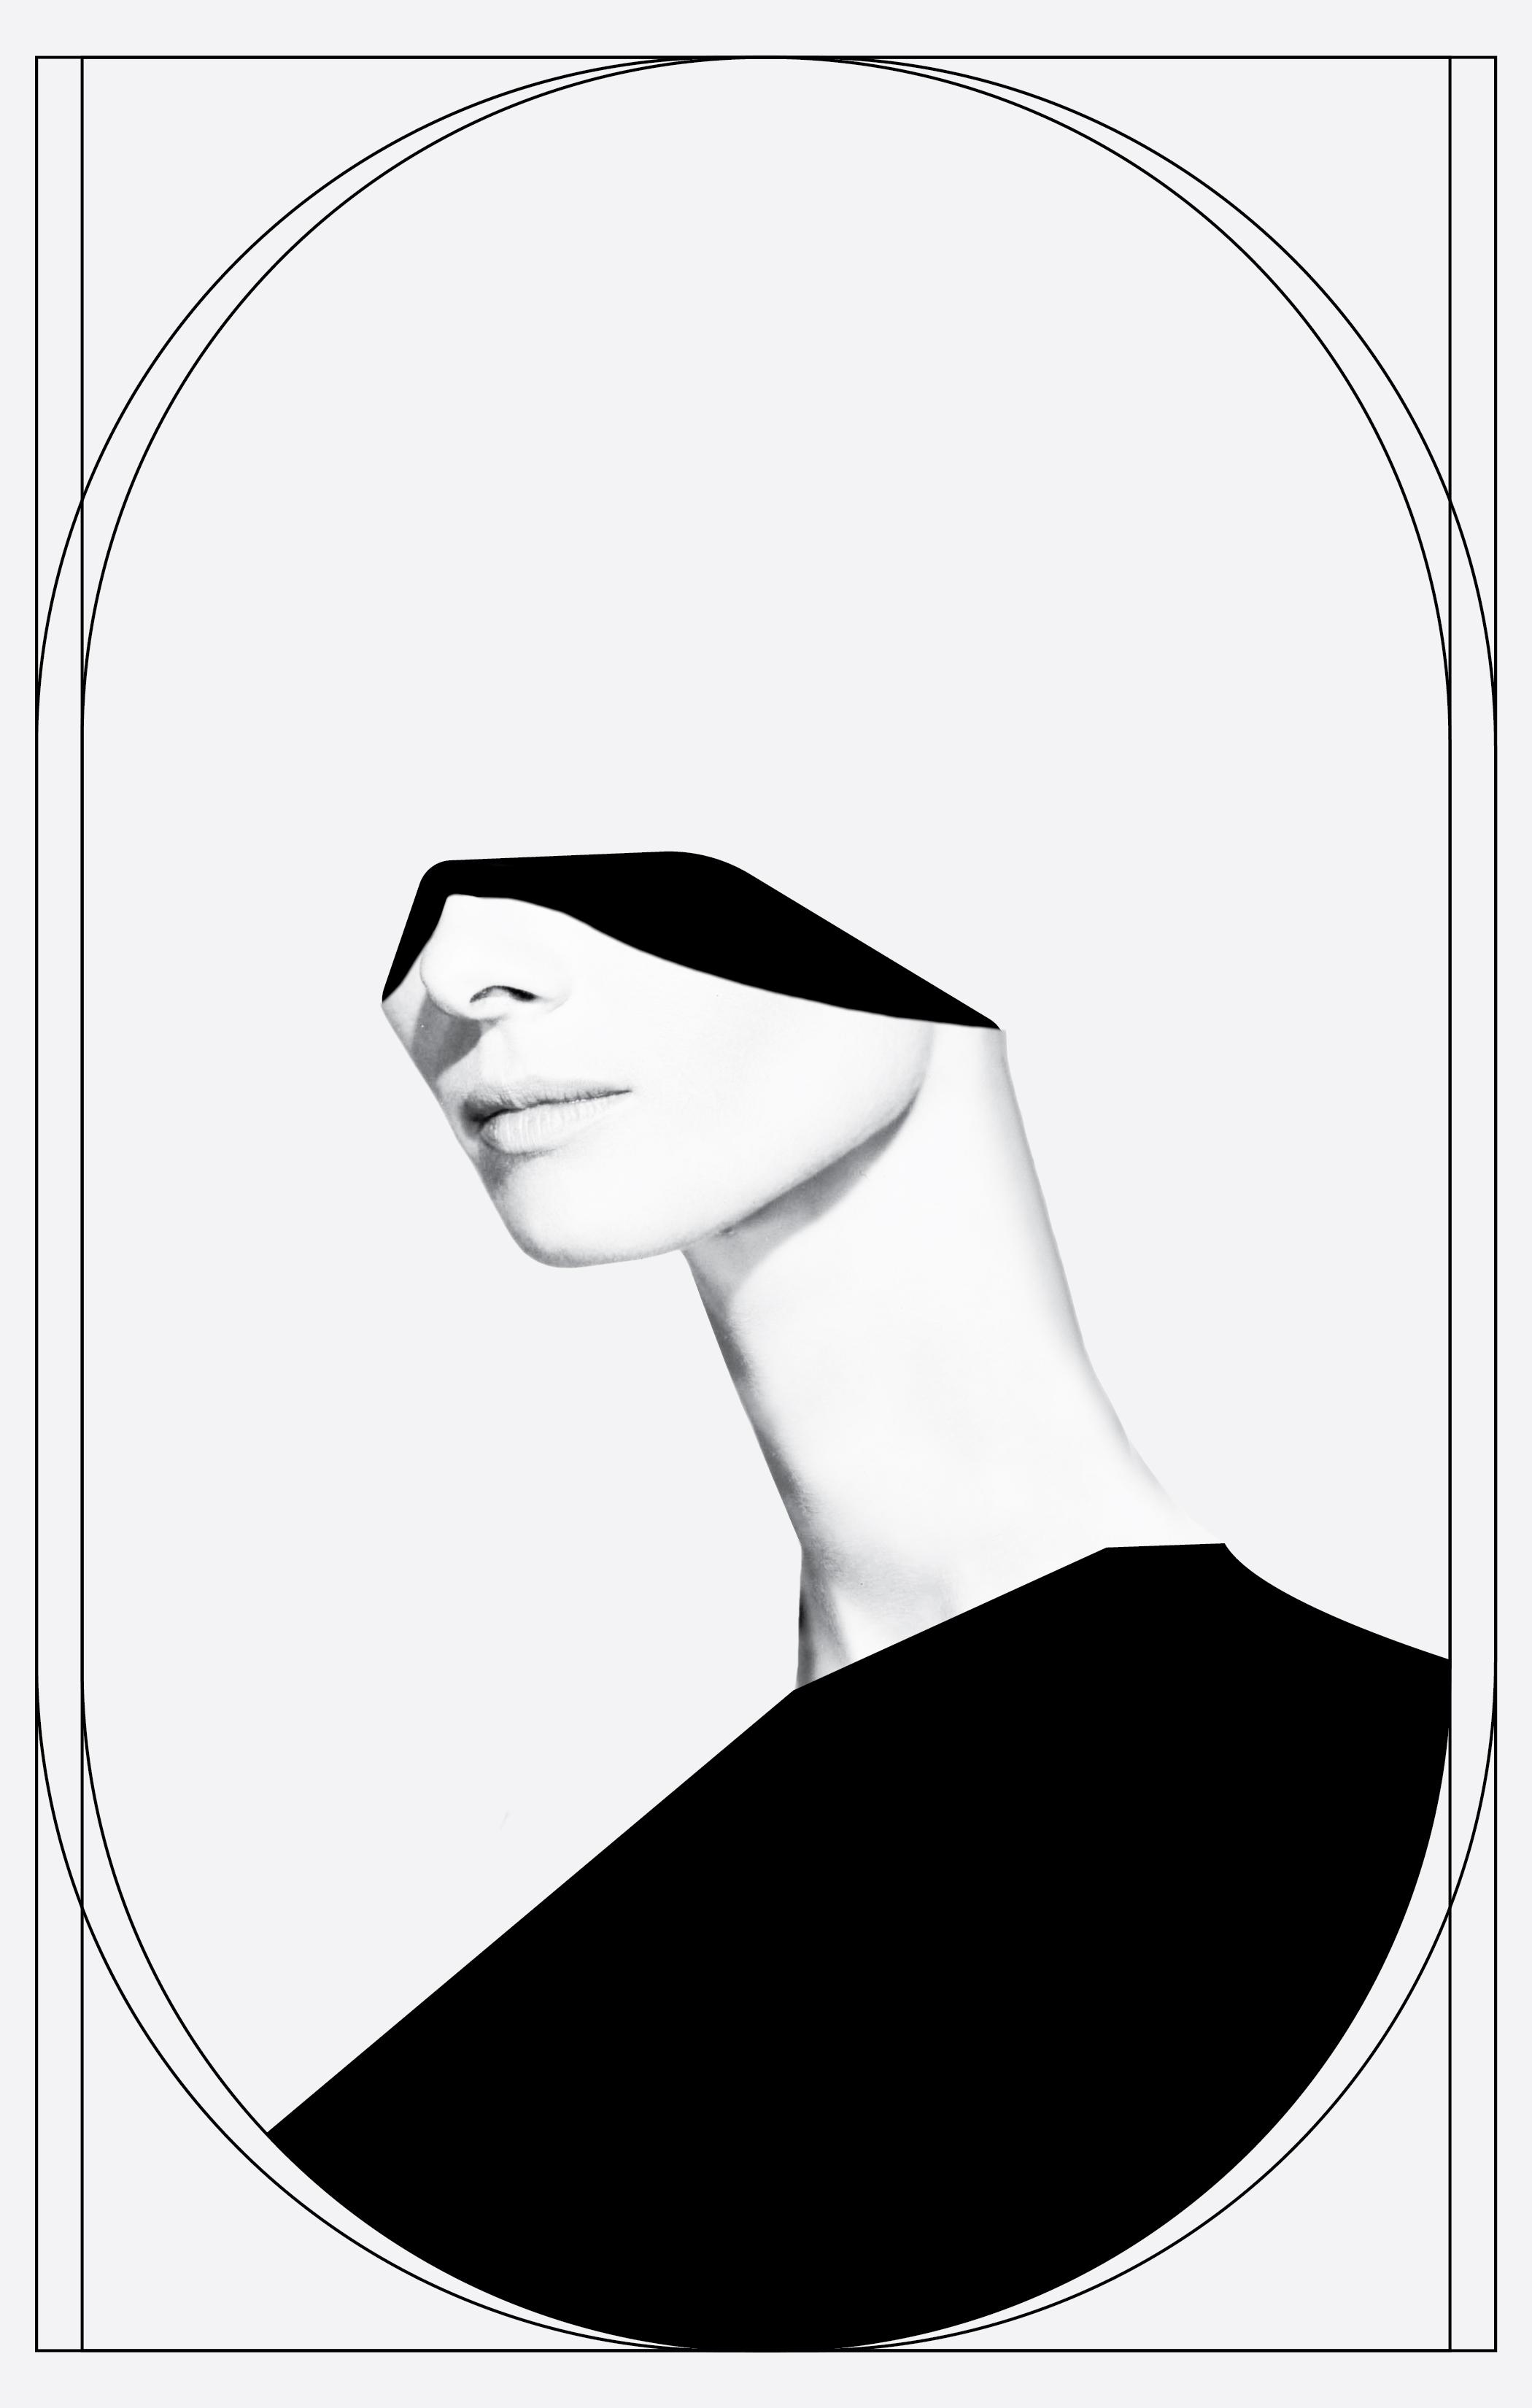 neck-01.jpg